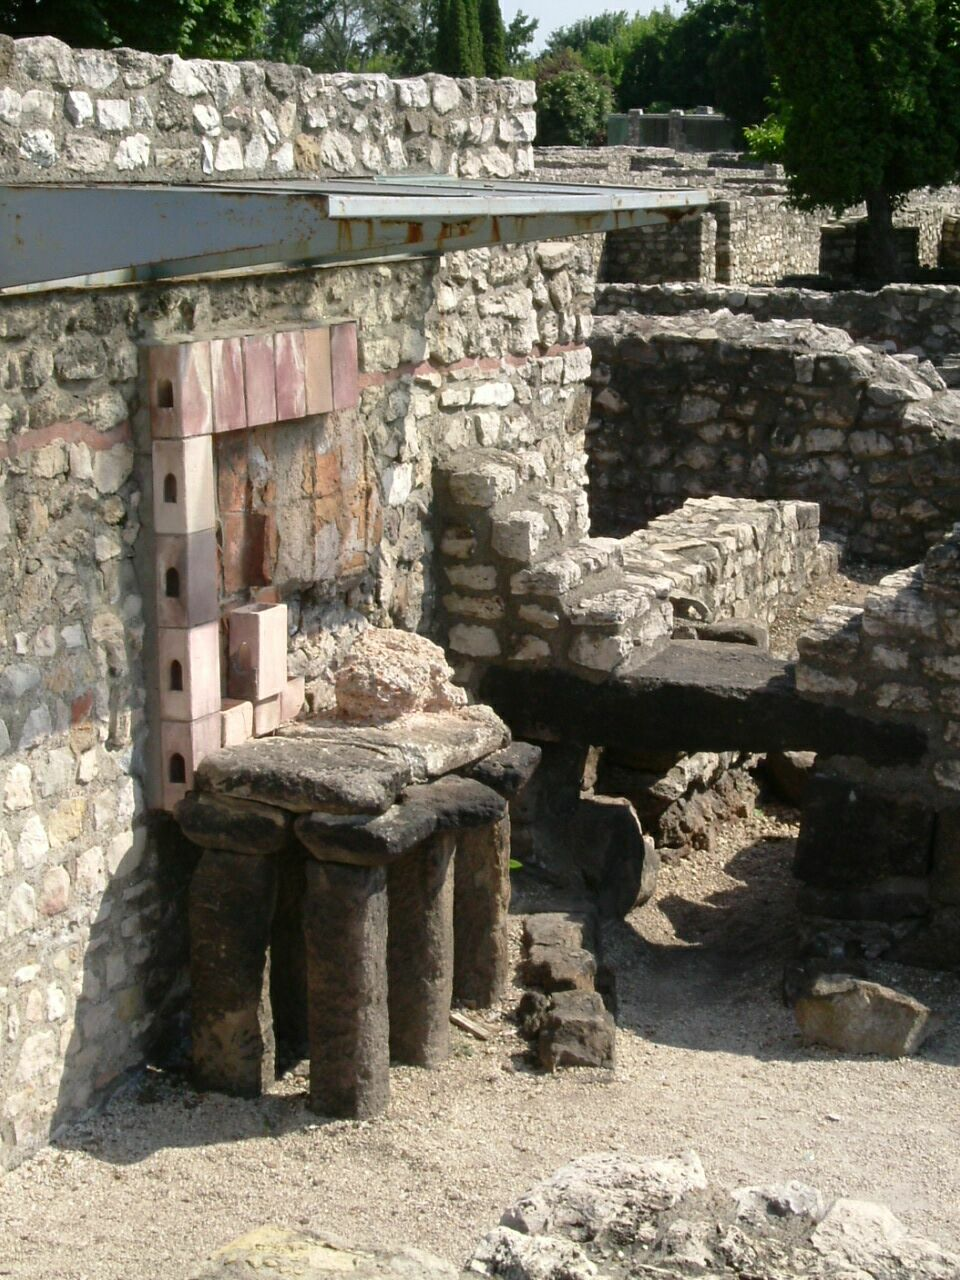 Az Aquincumi fürdő padlófűtése (wikipedia)